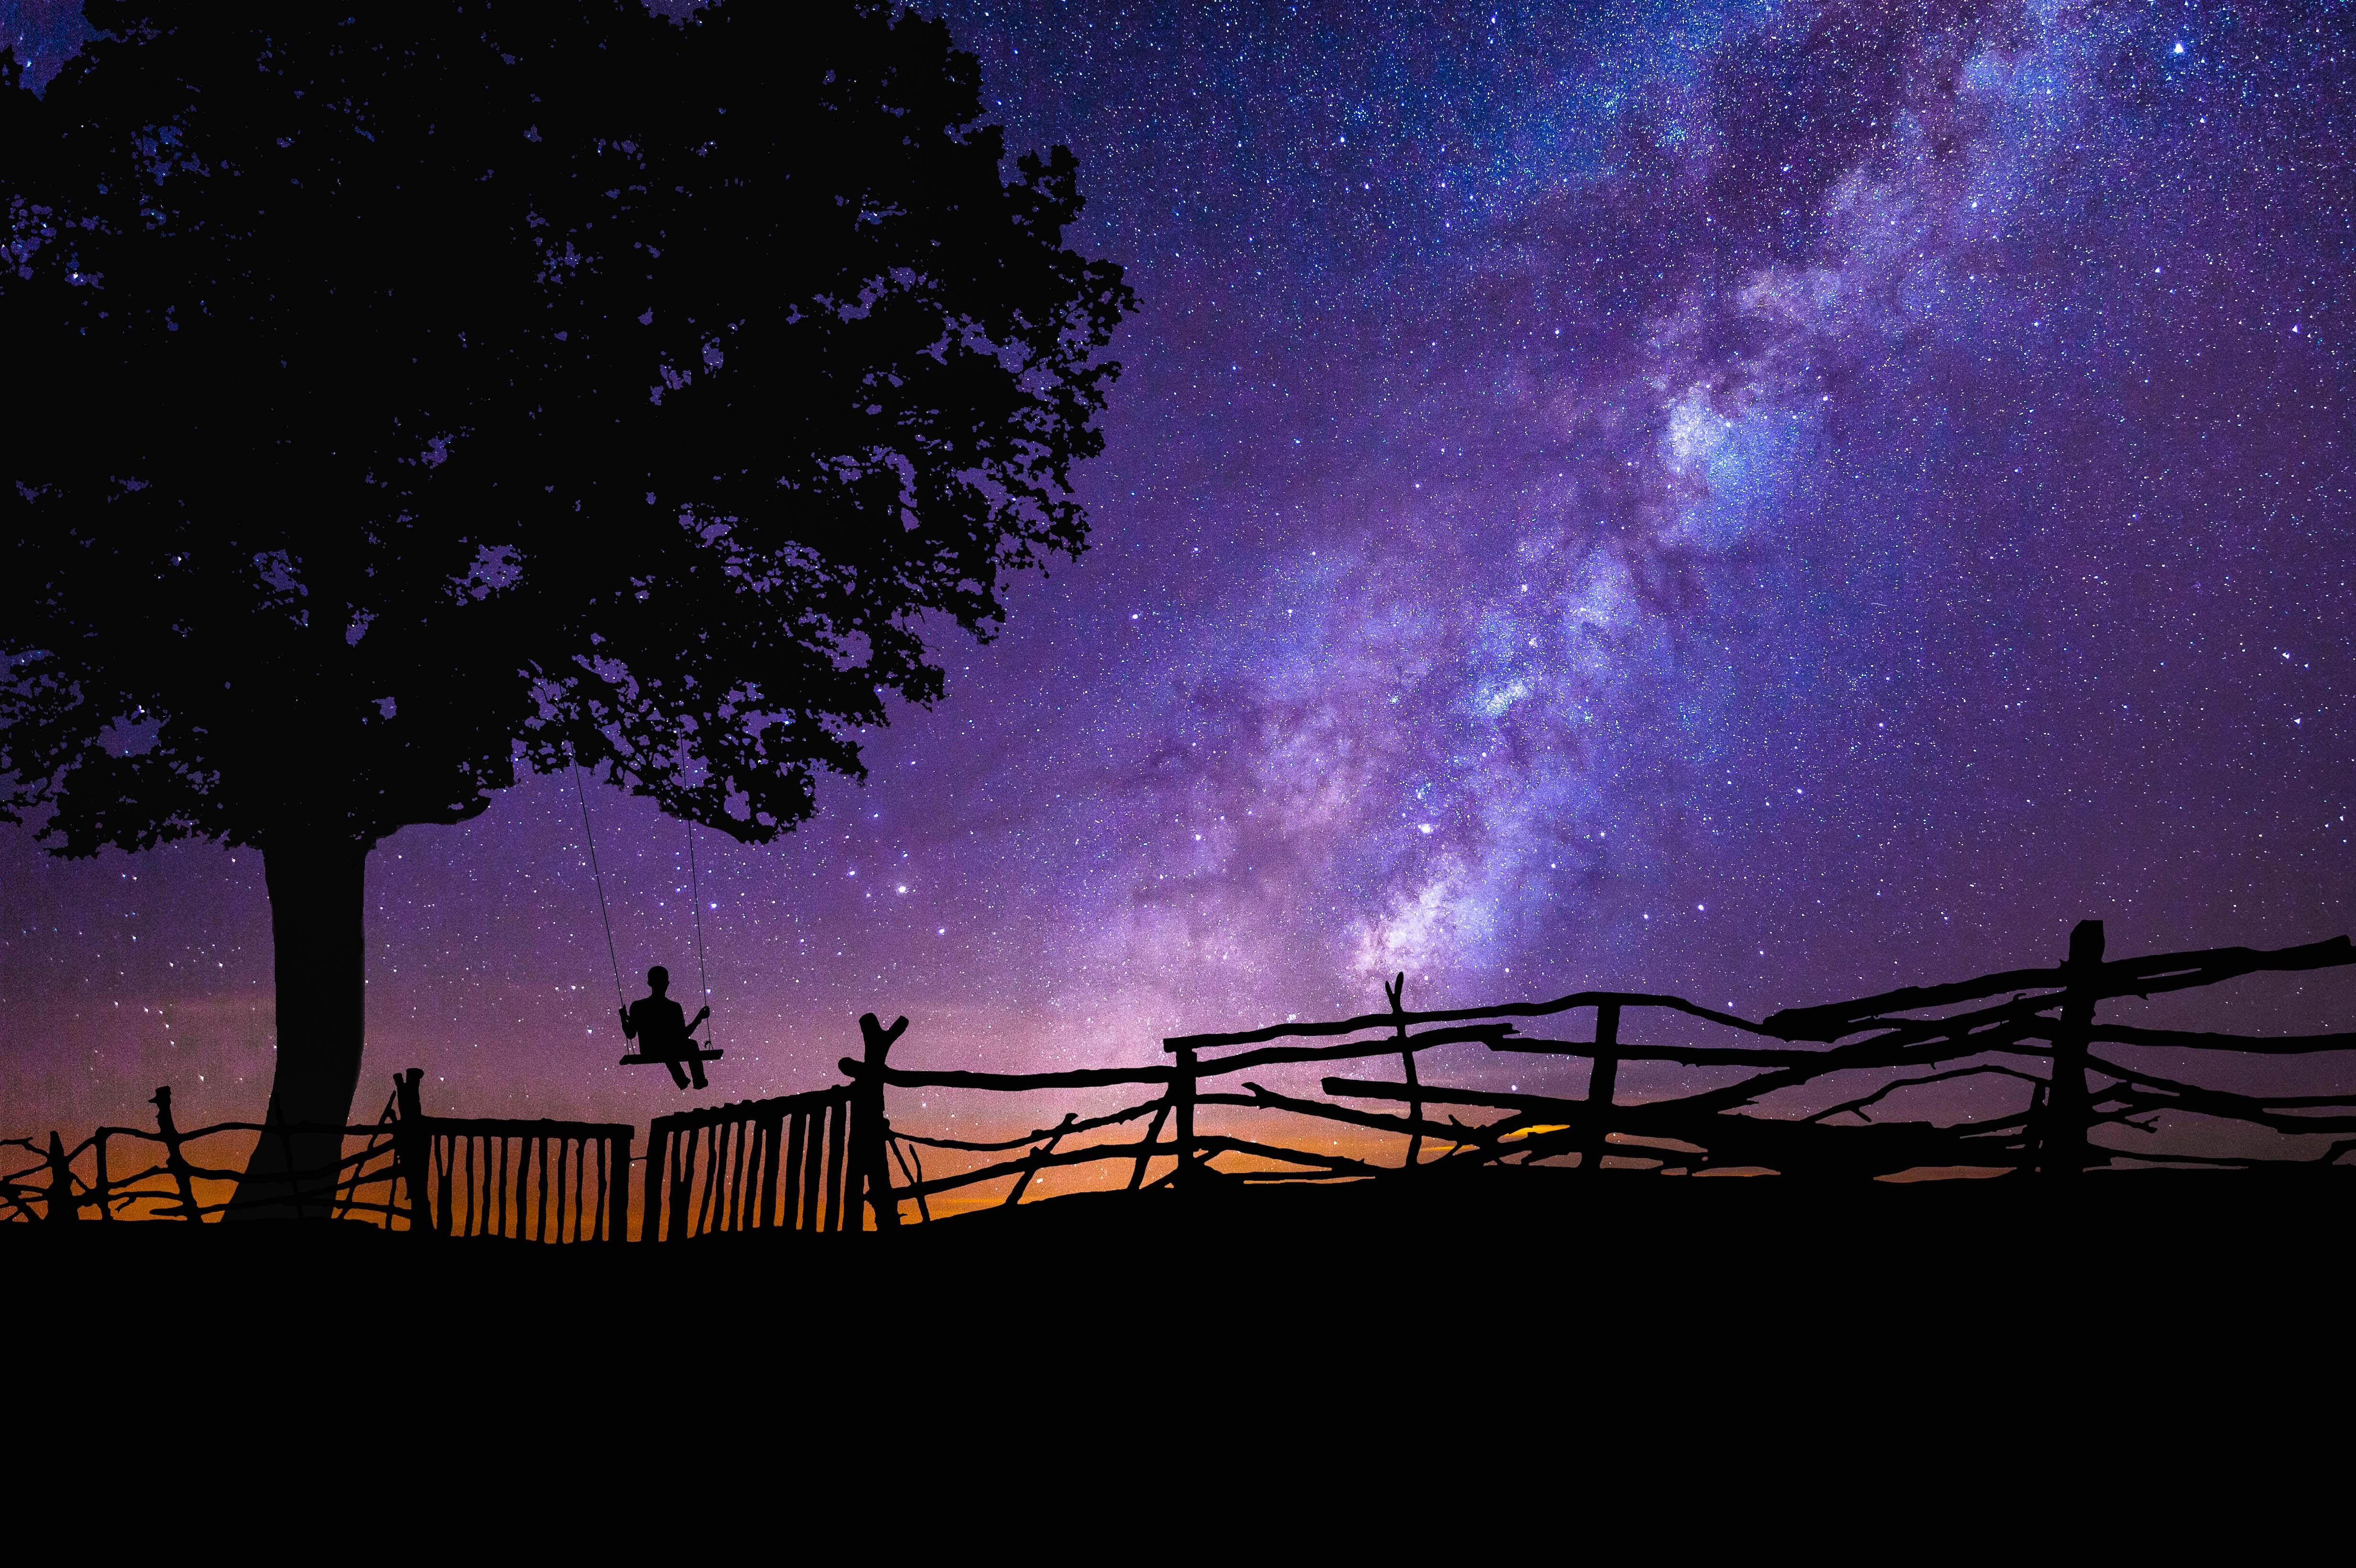 Good Wallpaper Night Galaxy - blue-purple-night-galaxy-stars-tree-person-swing-4k-wallpaper  Collection-39994.jpg